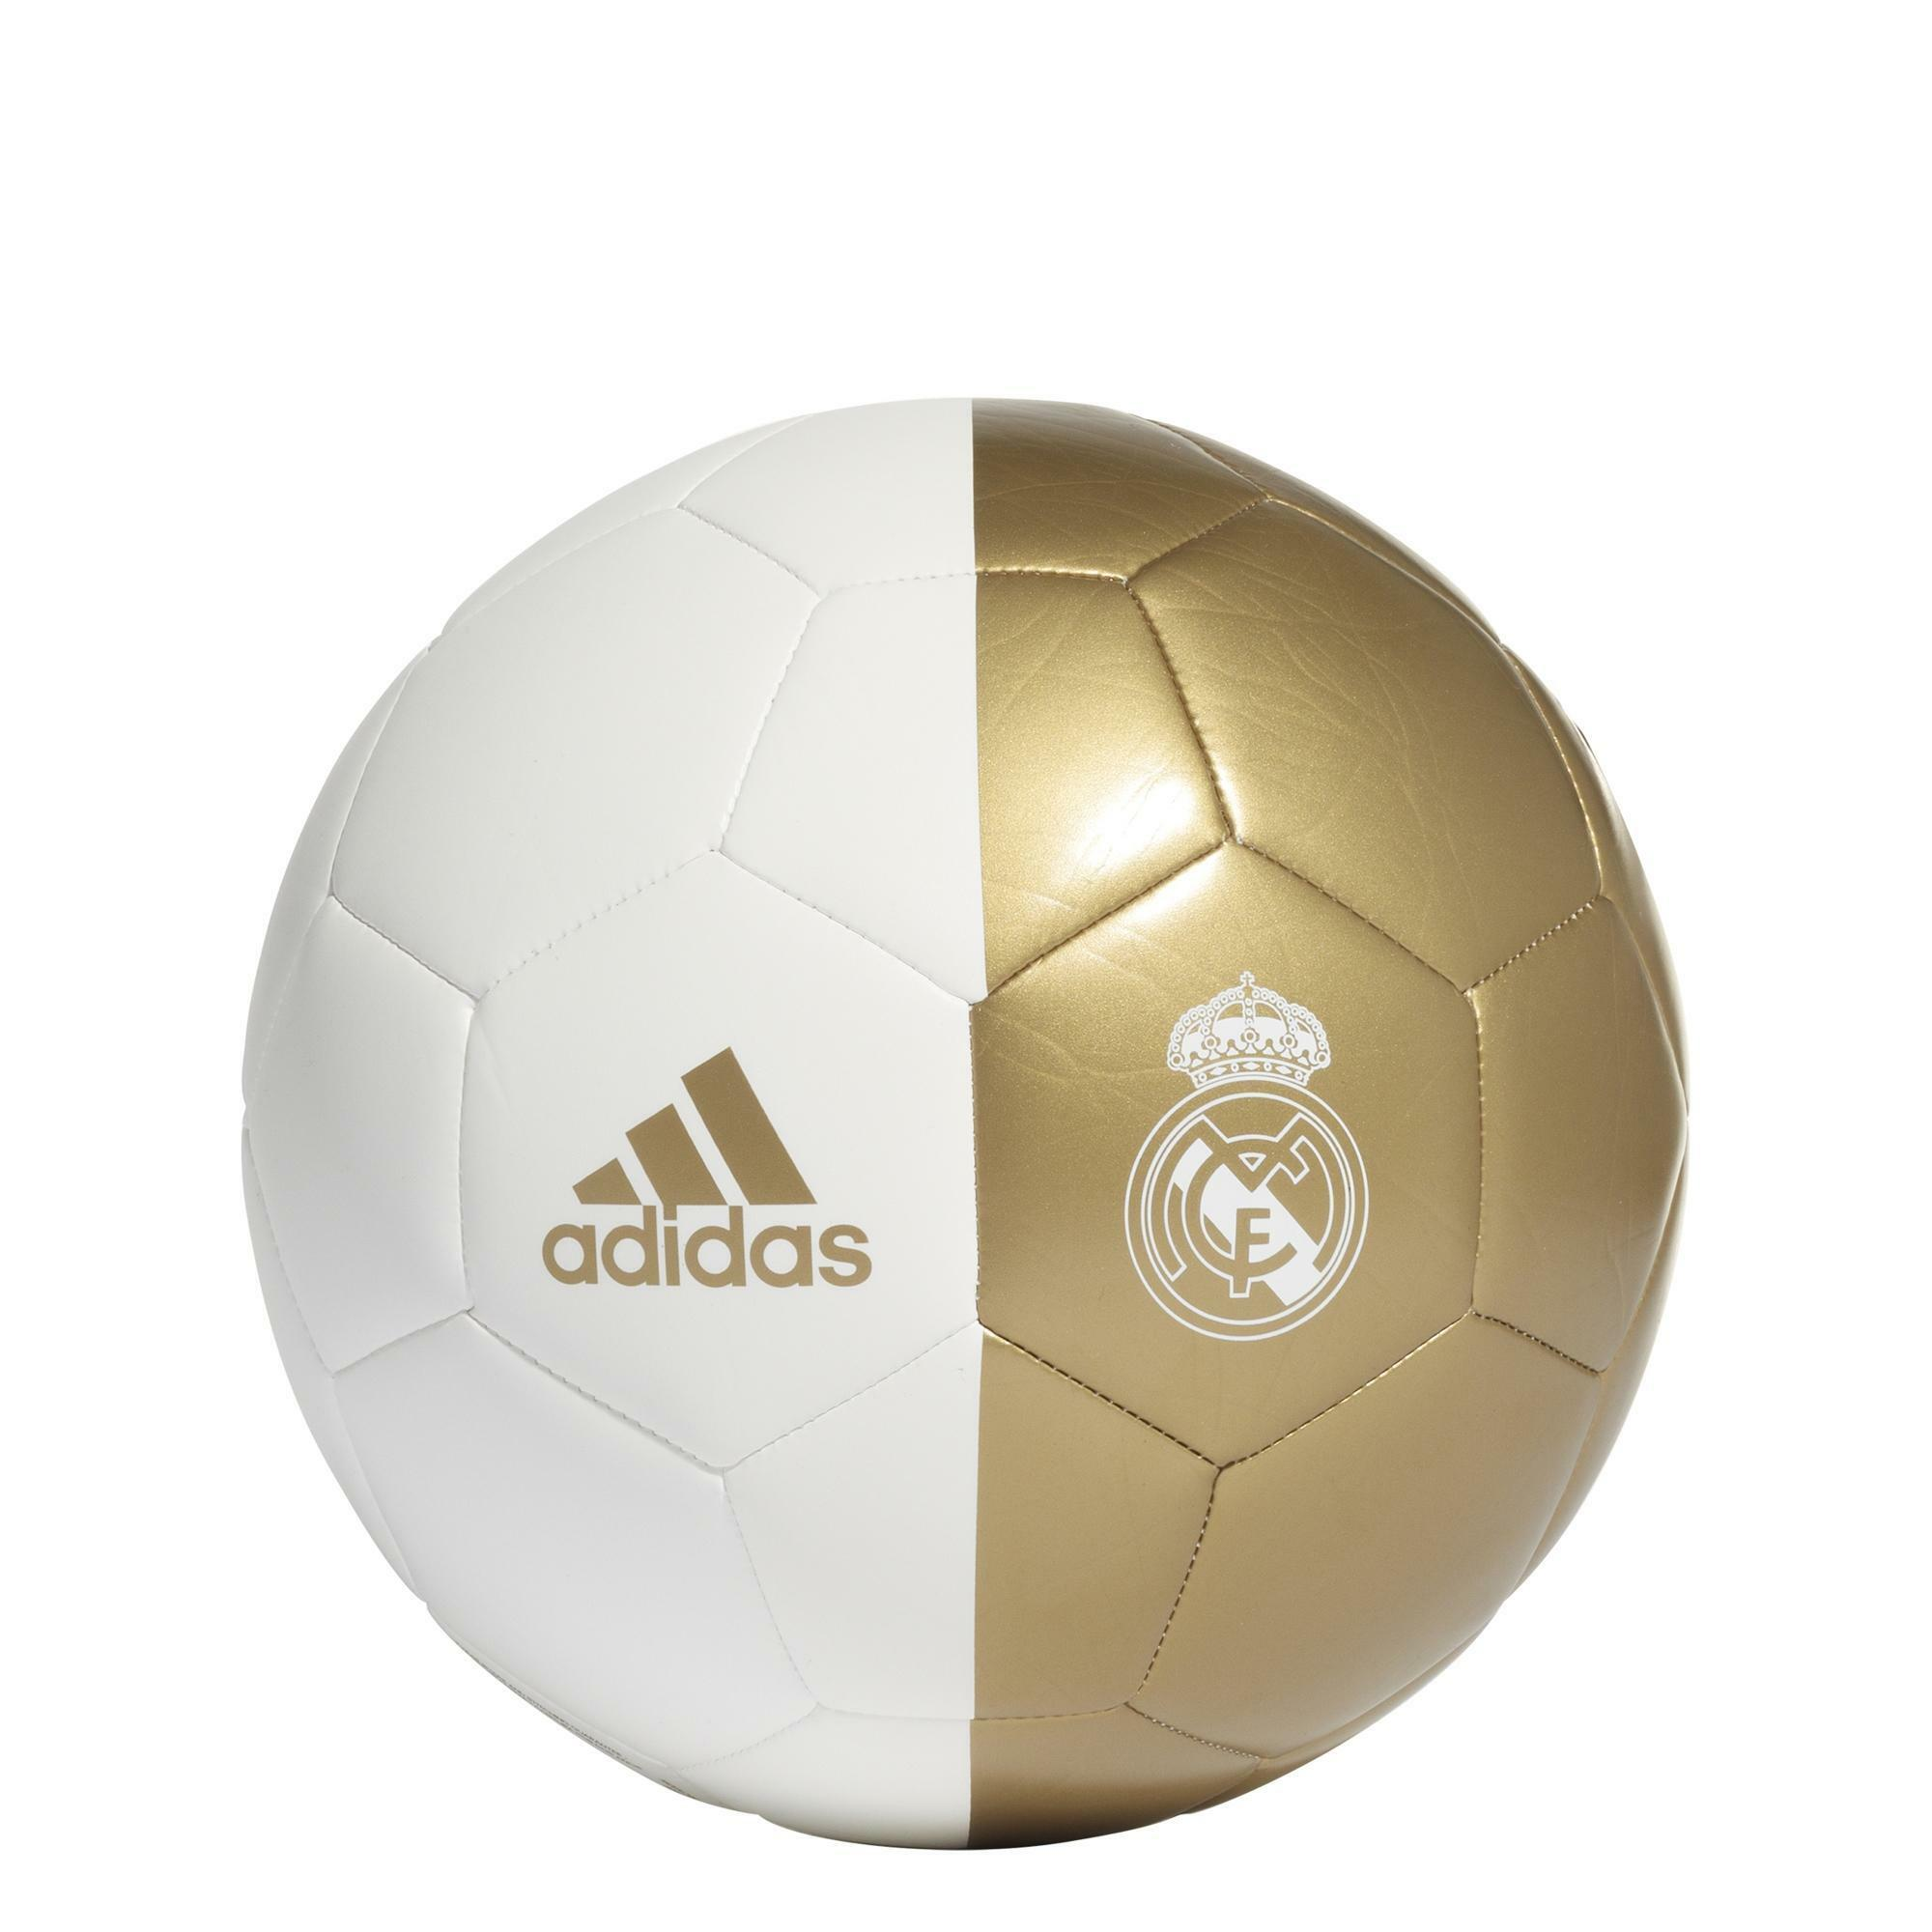 adidas adidas pallone calcio real madrid 19/20